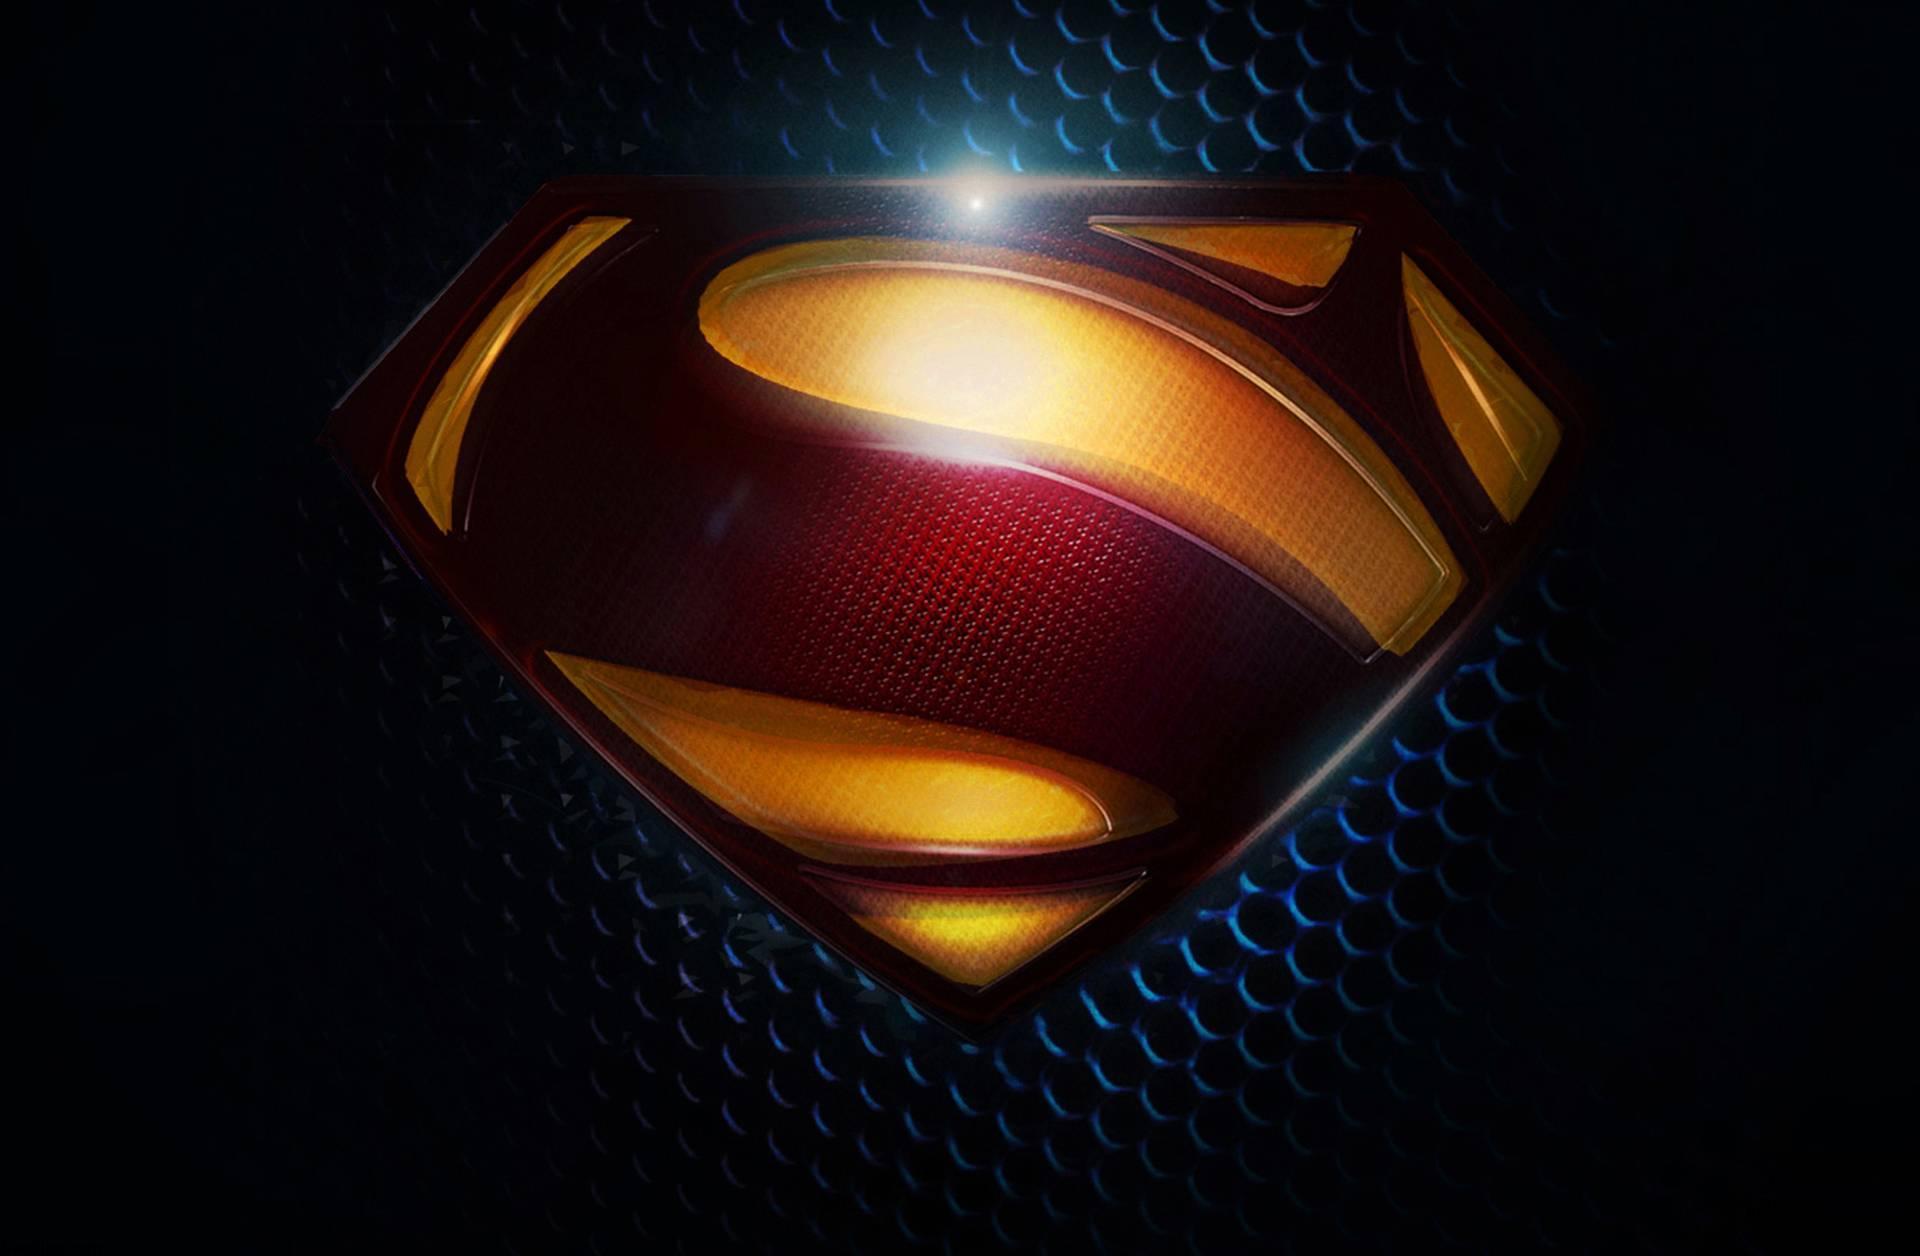 Download Best Movie Wallpaper Superman Desktop Background Full Size 1920x1256